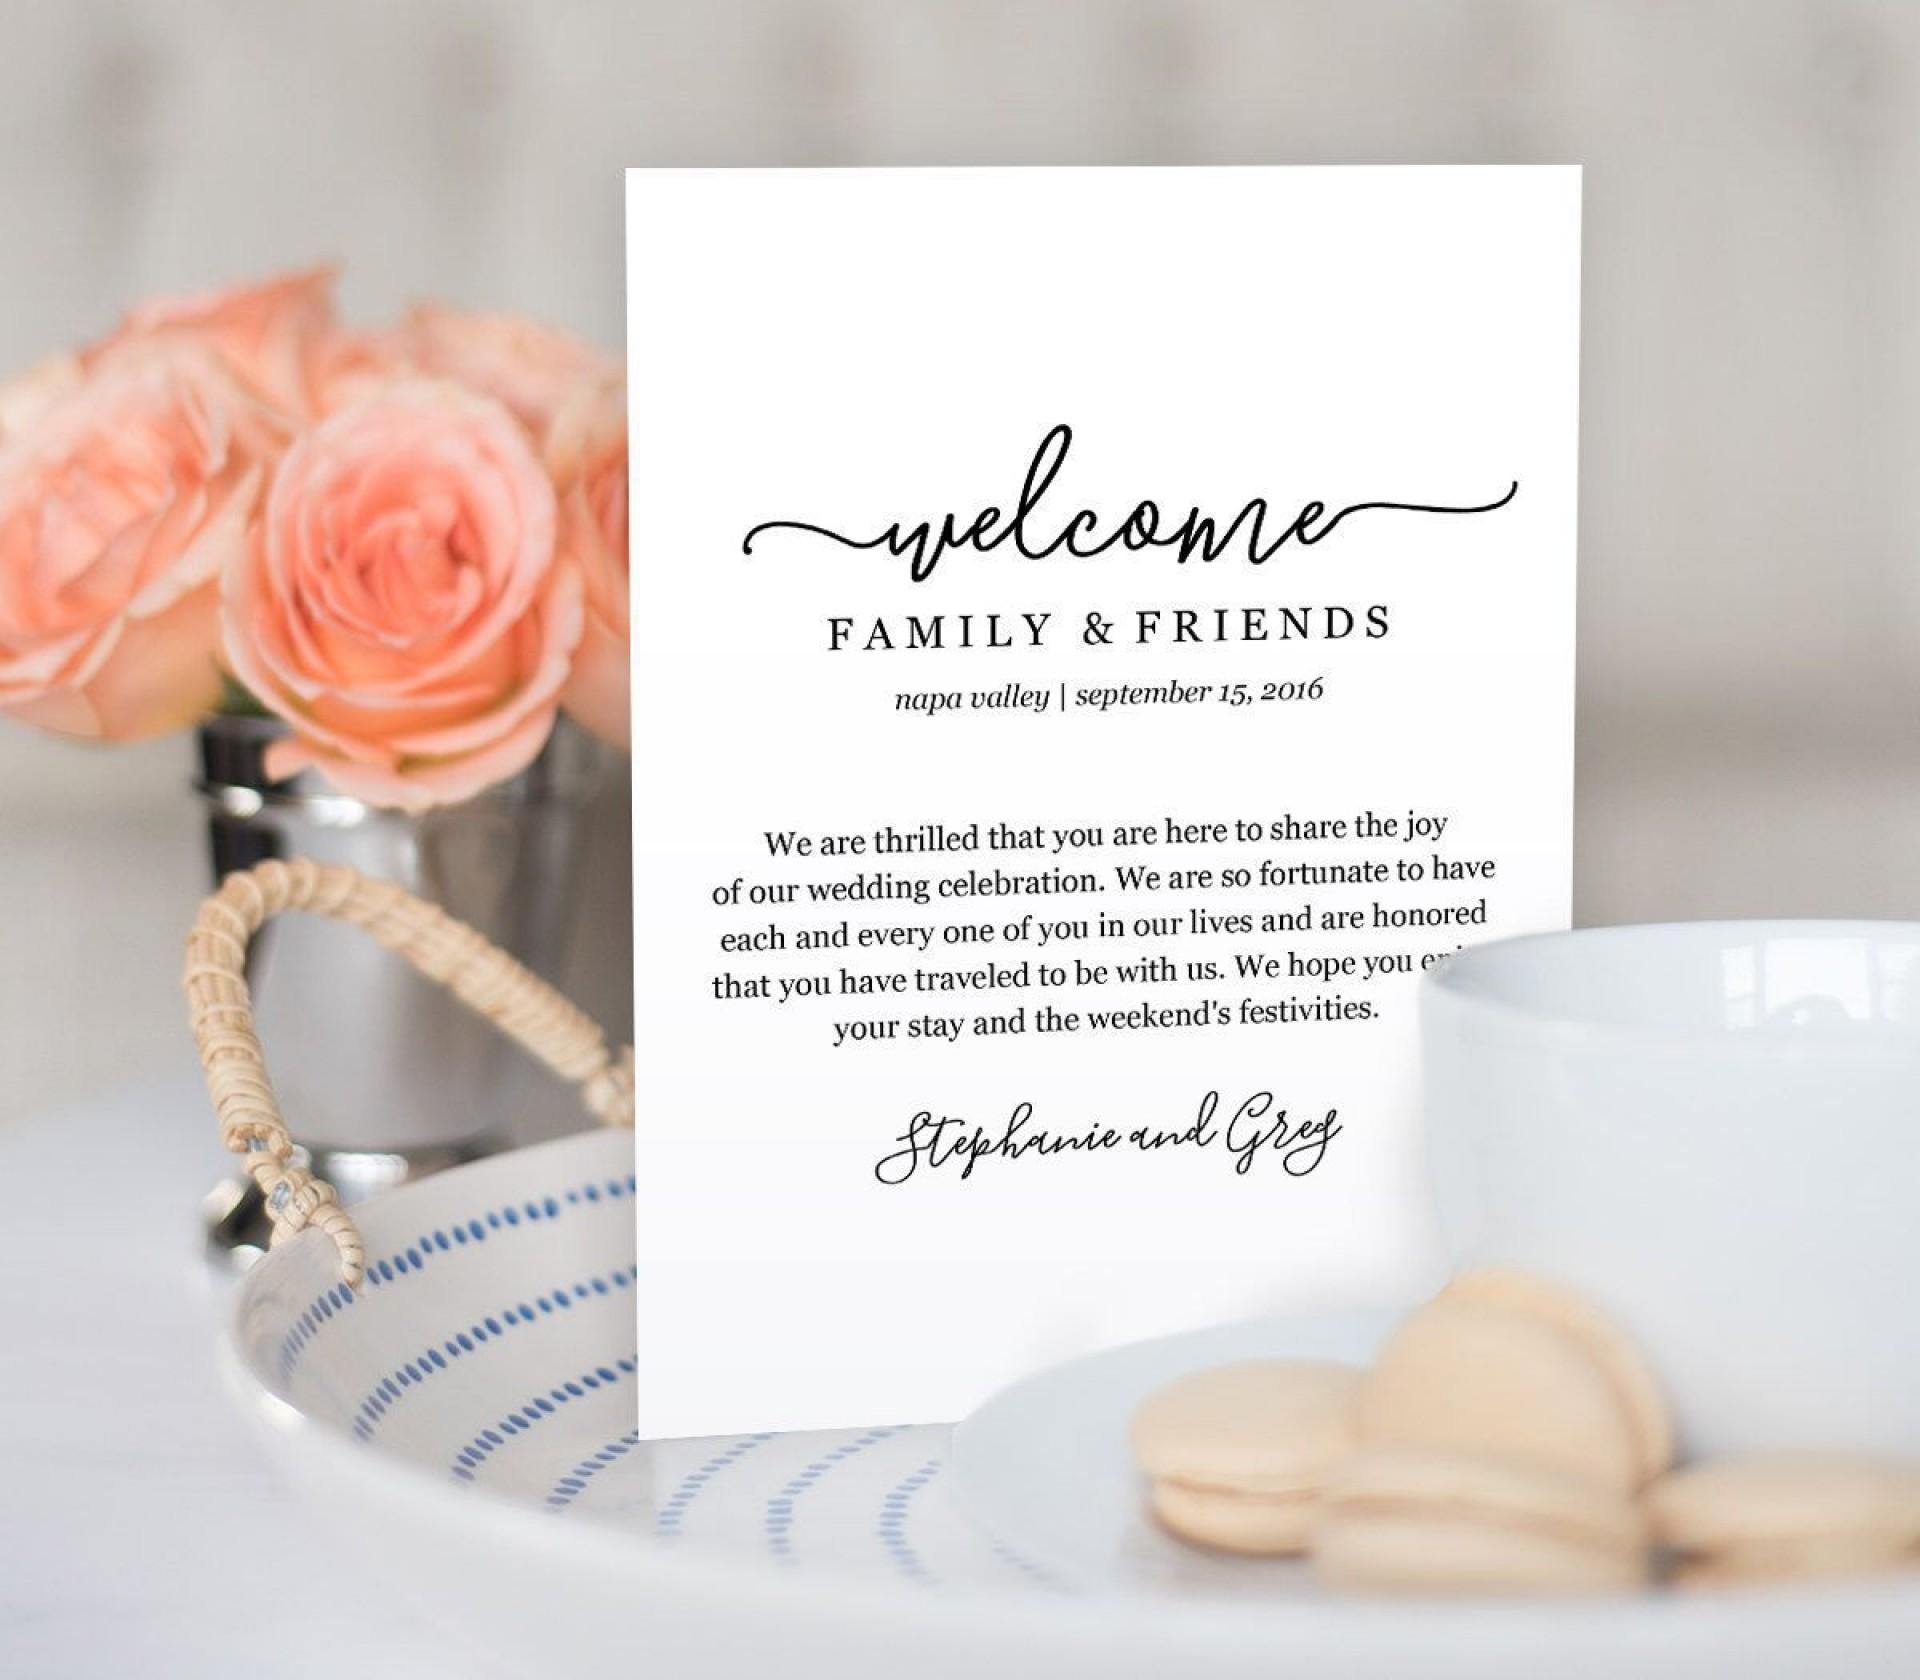 000 Sensational Wedding Welcome Bag Letter Template Idea  Free1920